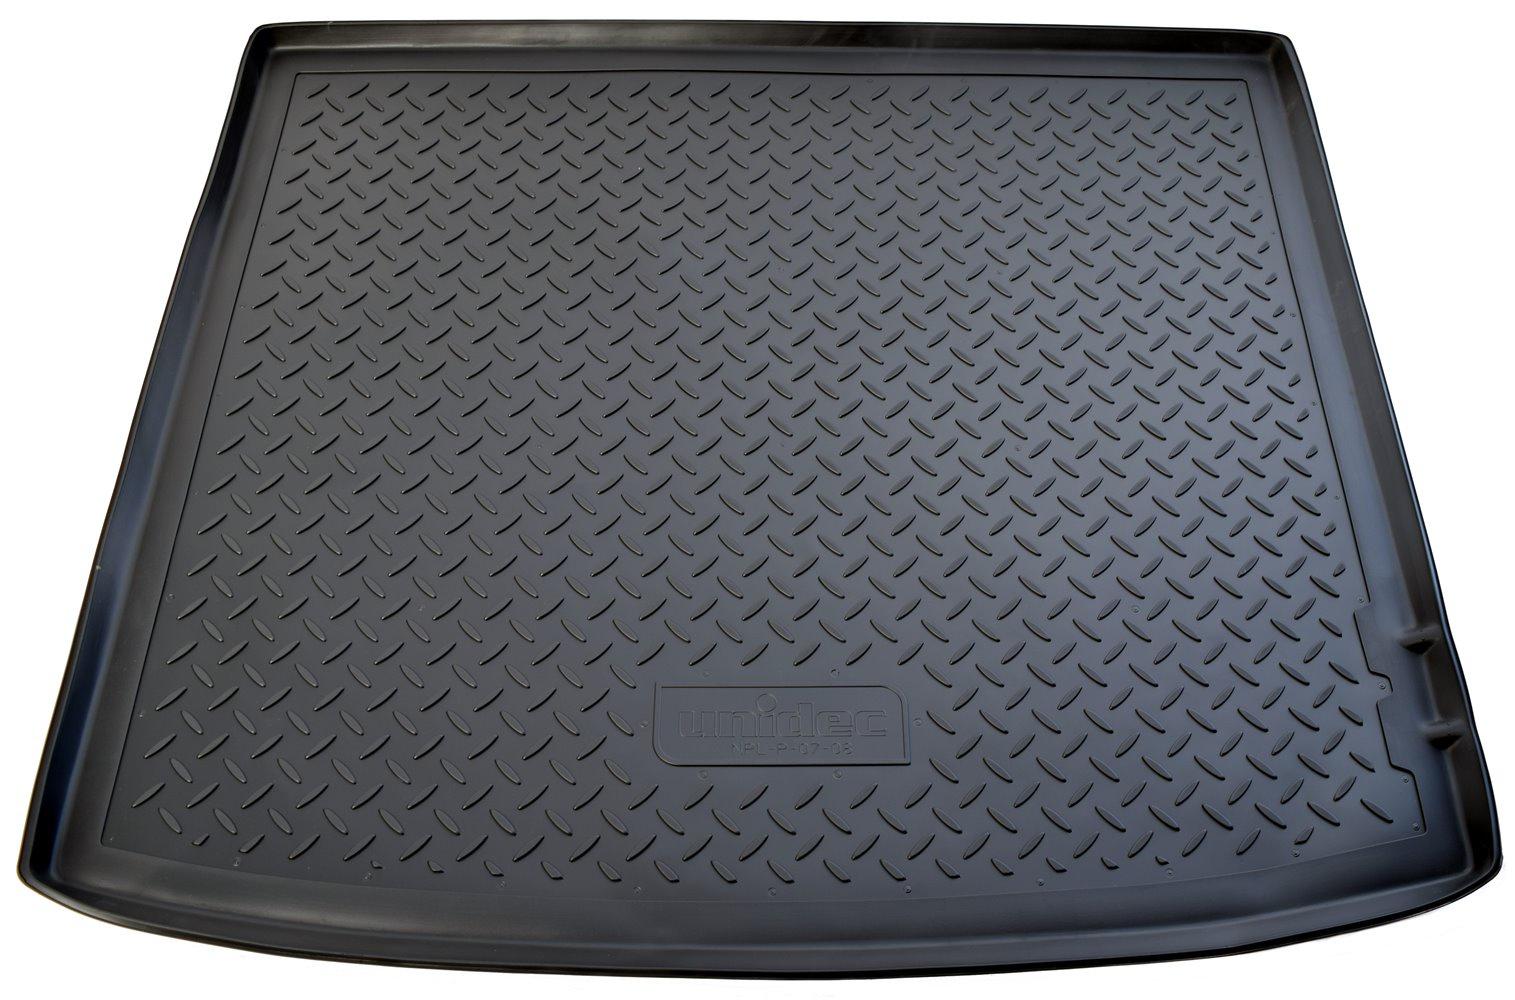 Коврик в багажник Norplast NPL-P-07-08 комплект ковриков в салон автомобиля klever bmw x6 f16 2014 standard